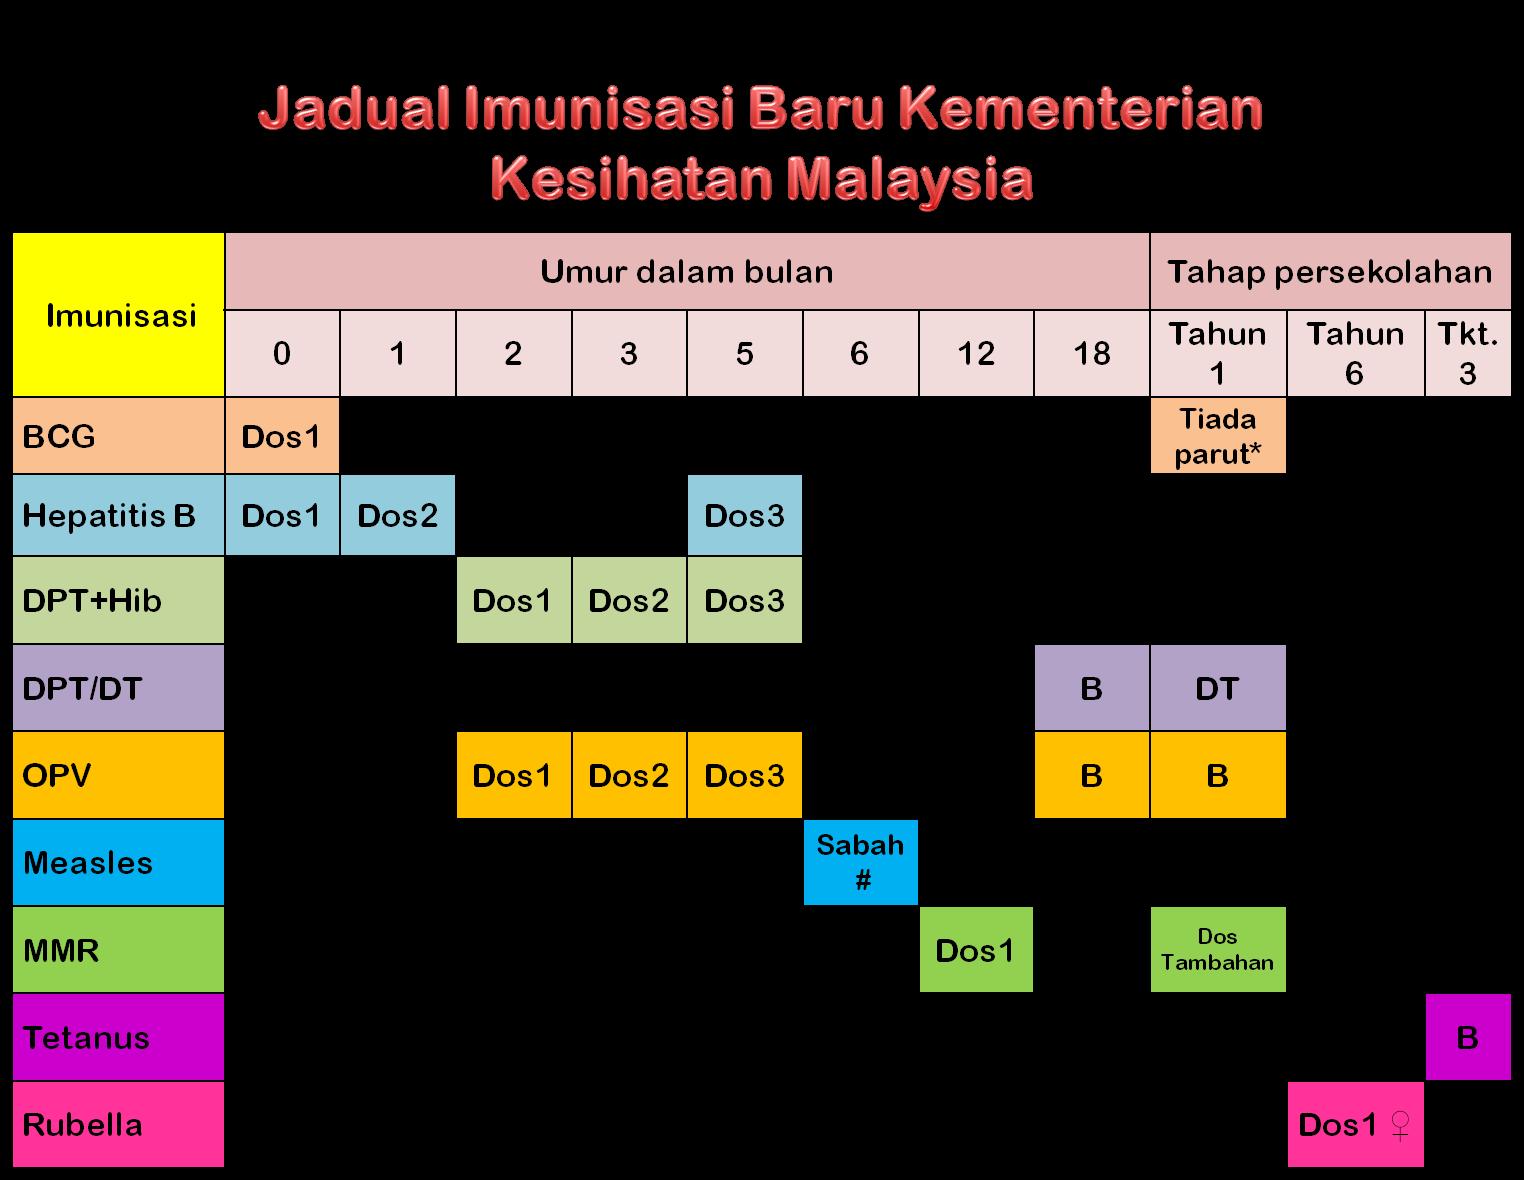 Jadual Imunisasi Bayi 2019